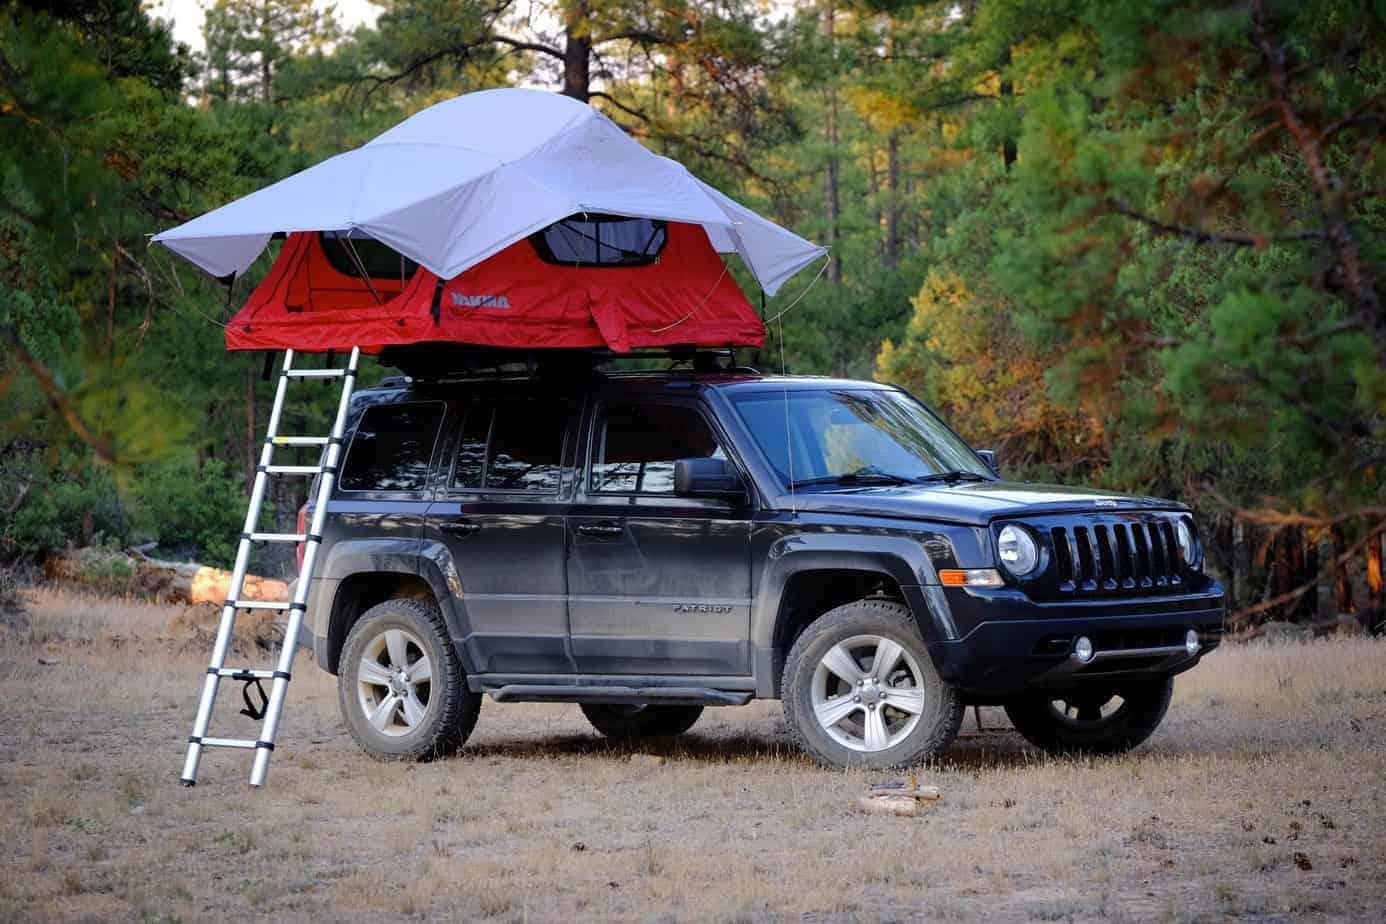 Long Term Test: Yakima SkyRise Rooftop Tent